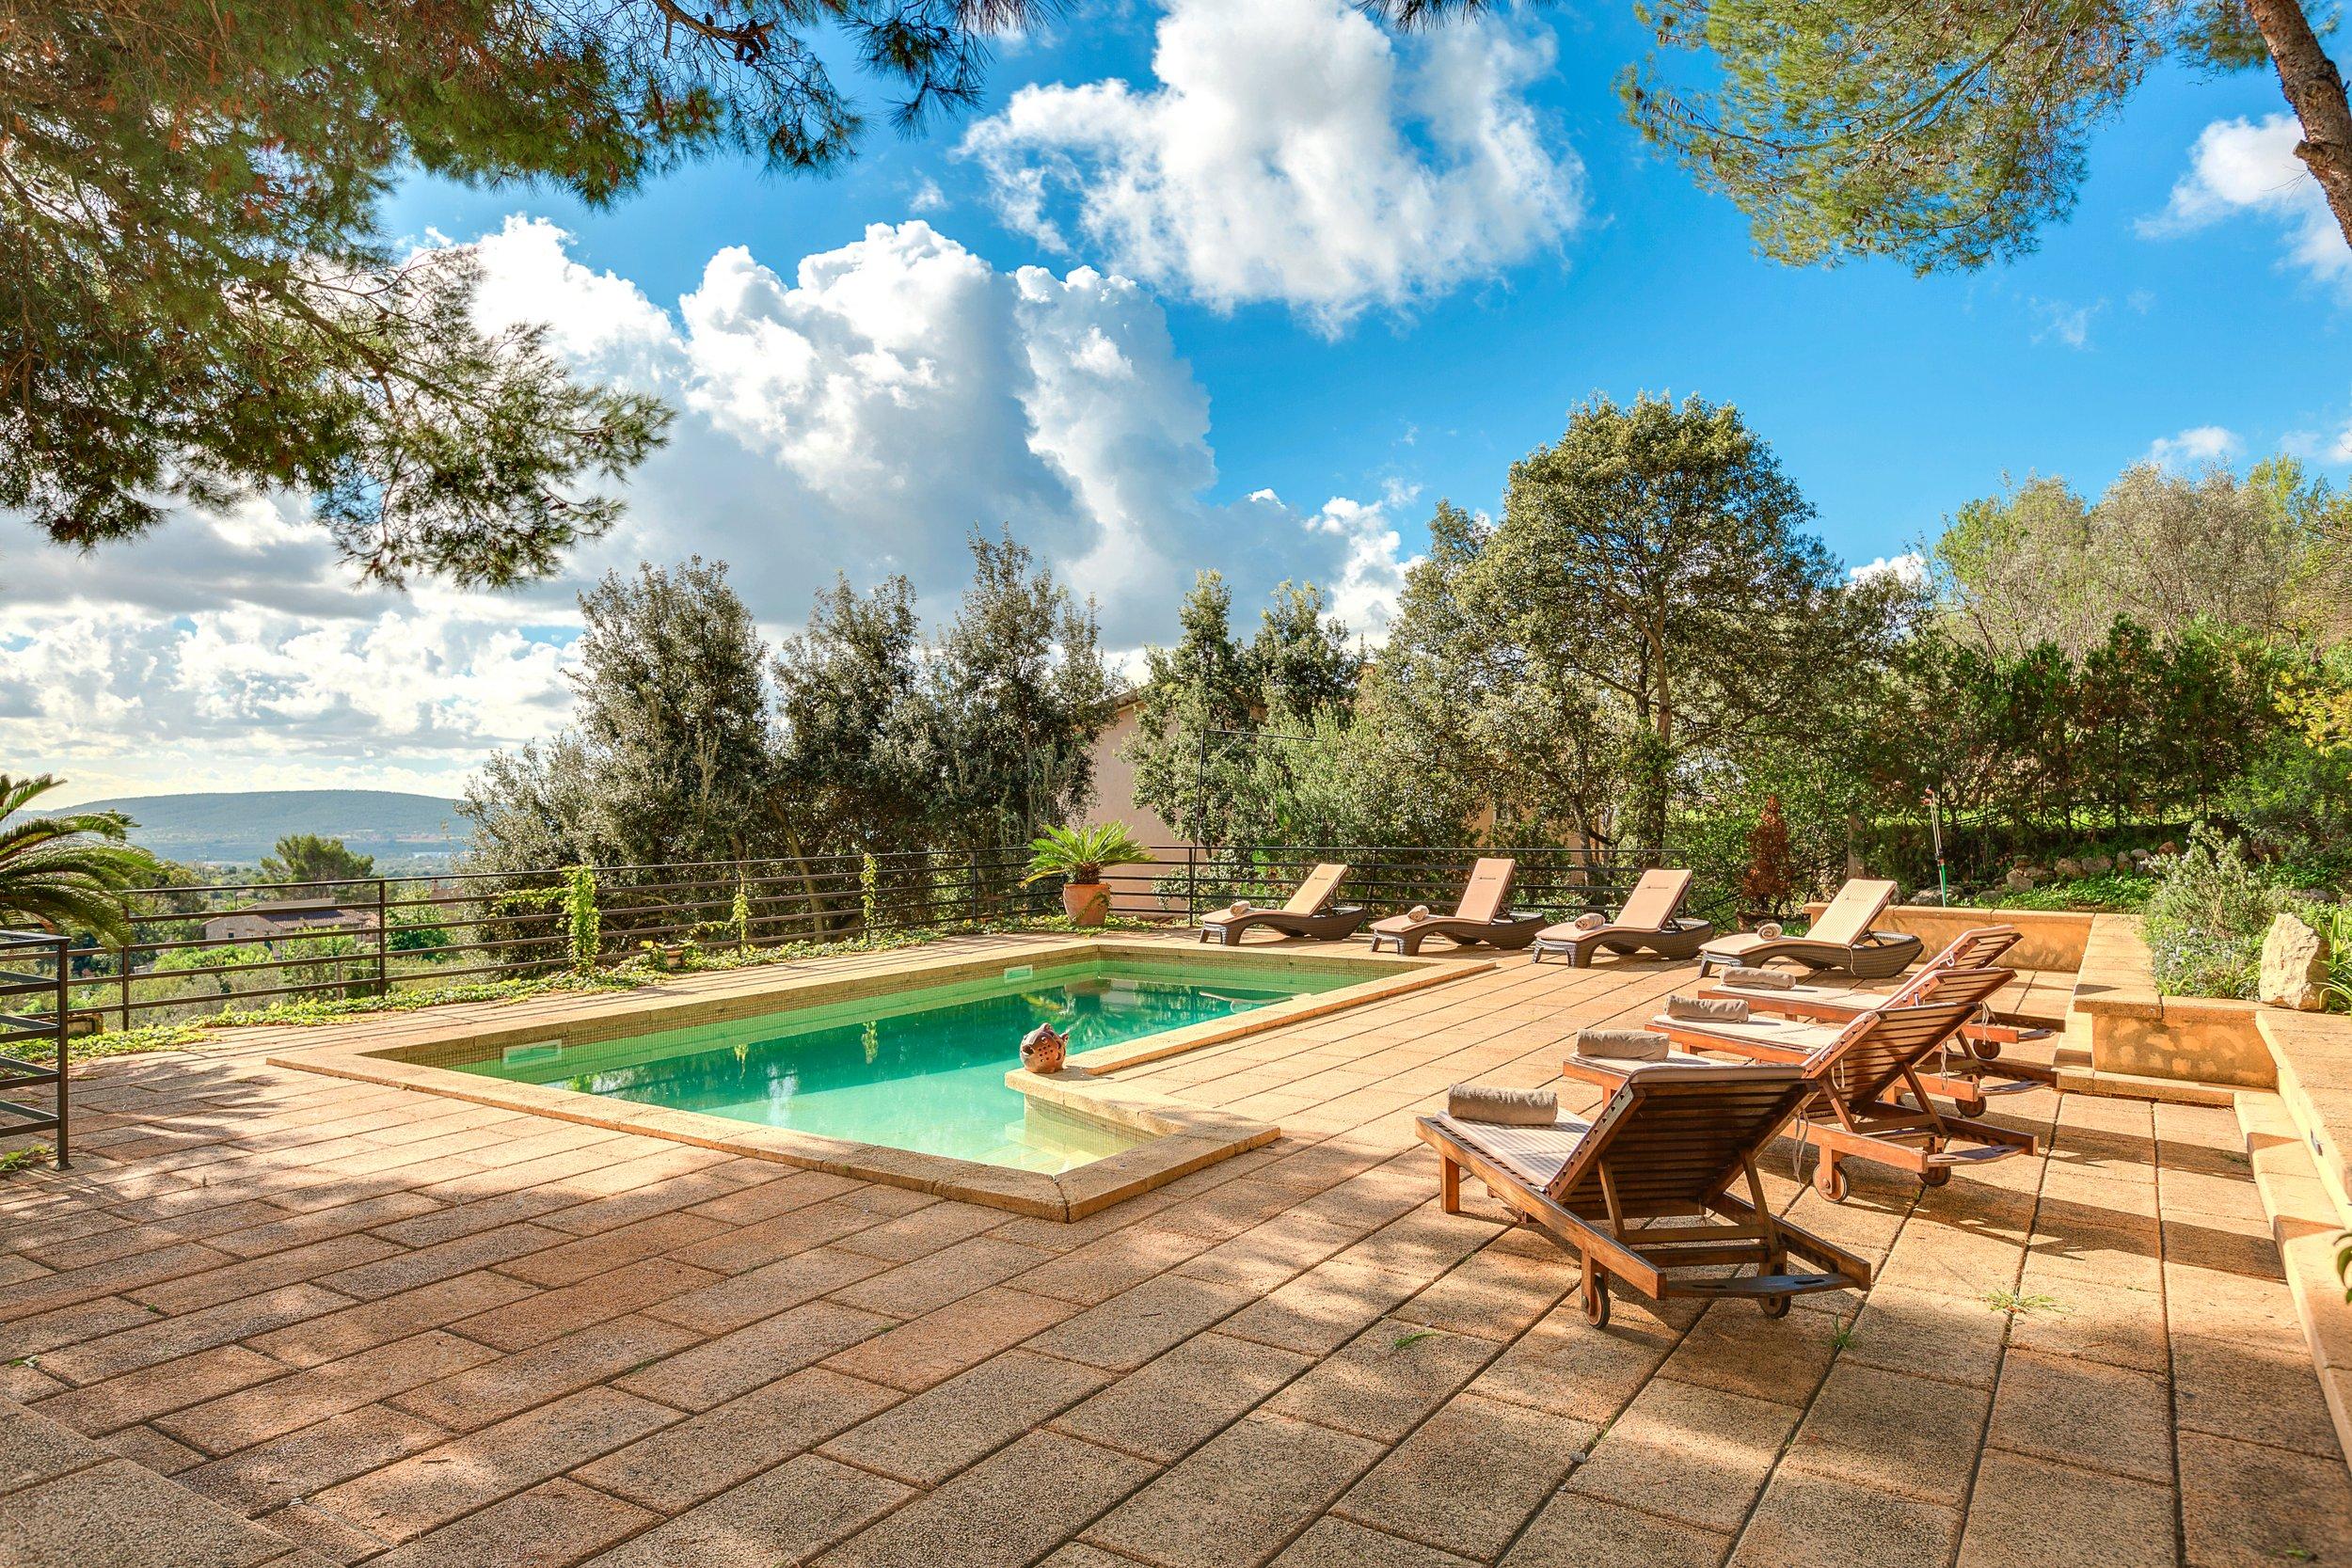 Maison de vacances Villa Cirera in Alaro (2611793), Alaro, Majorque, Iles Baléares, Espagne, image 3